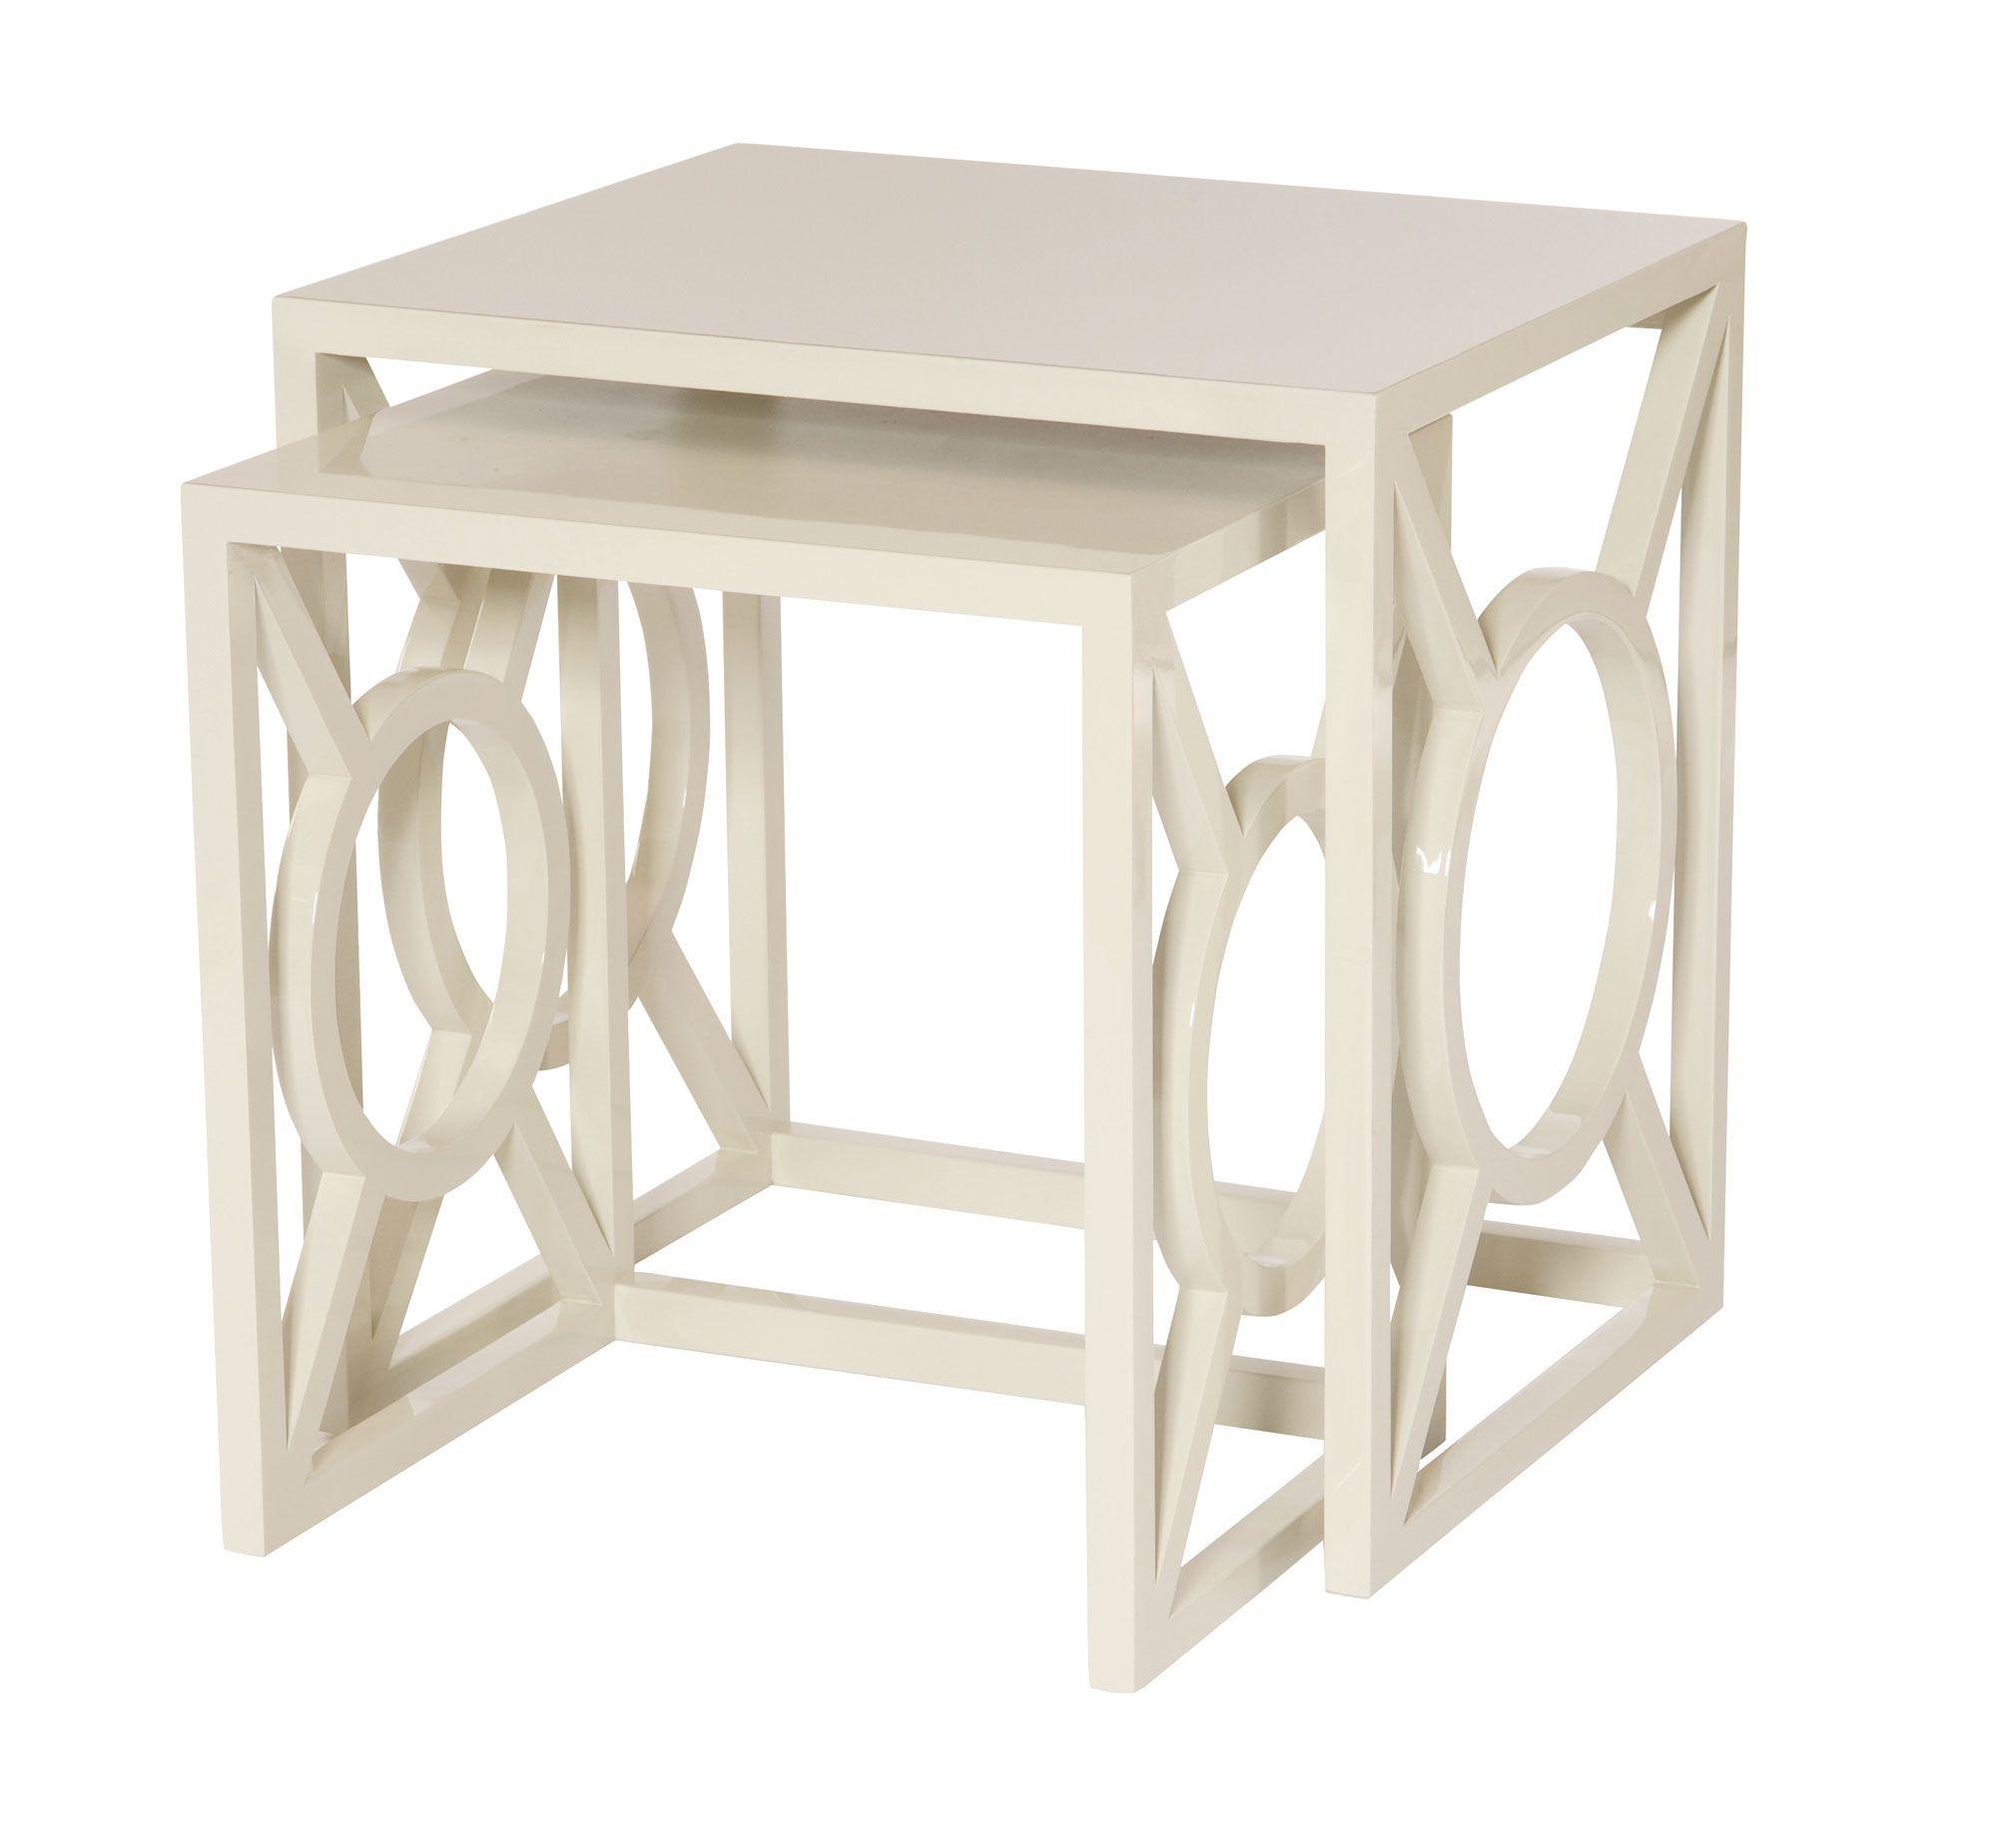 348-030 Zara Nesting Tables | Bernhardt W 24 D 20 H 24 Alabaster ...